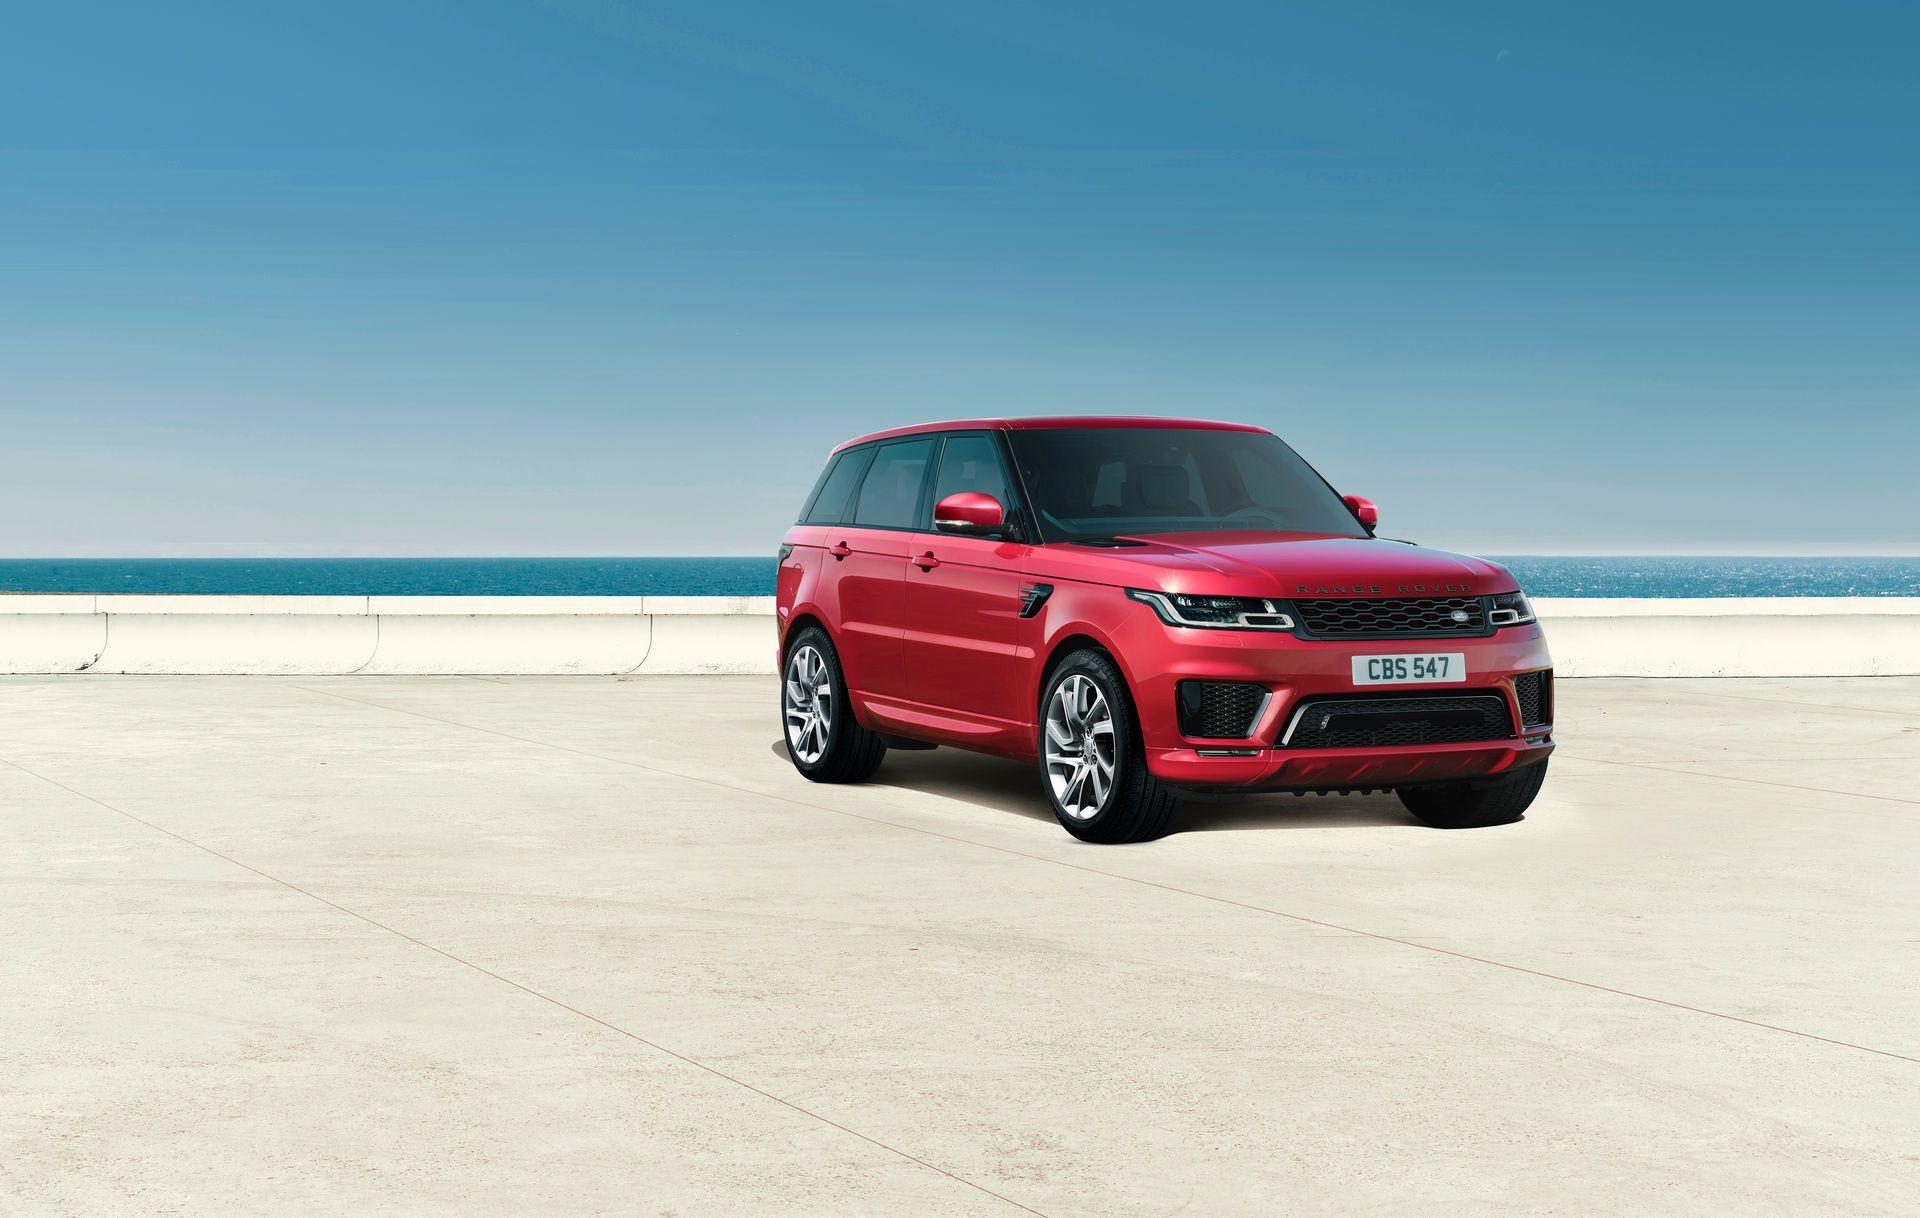 2021-Range-Rover-Sport-10